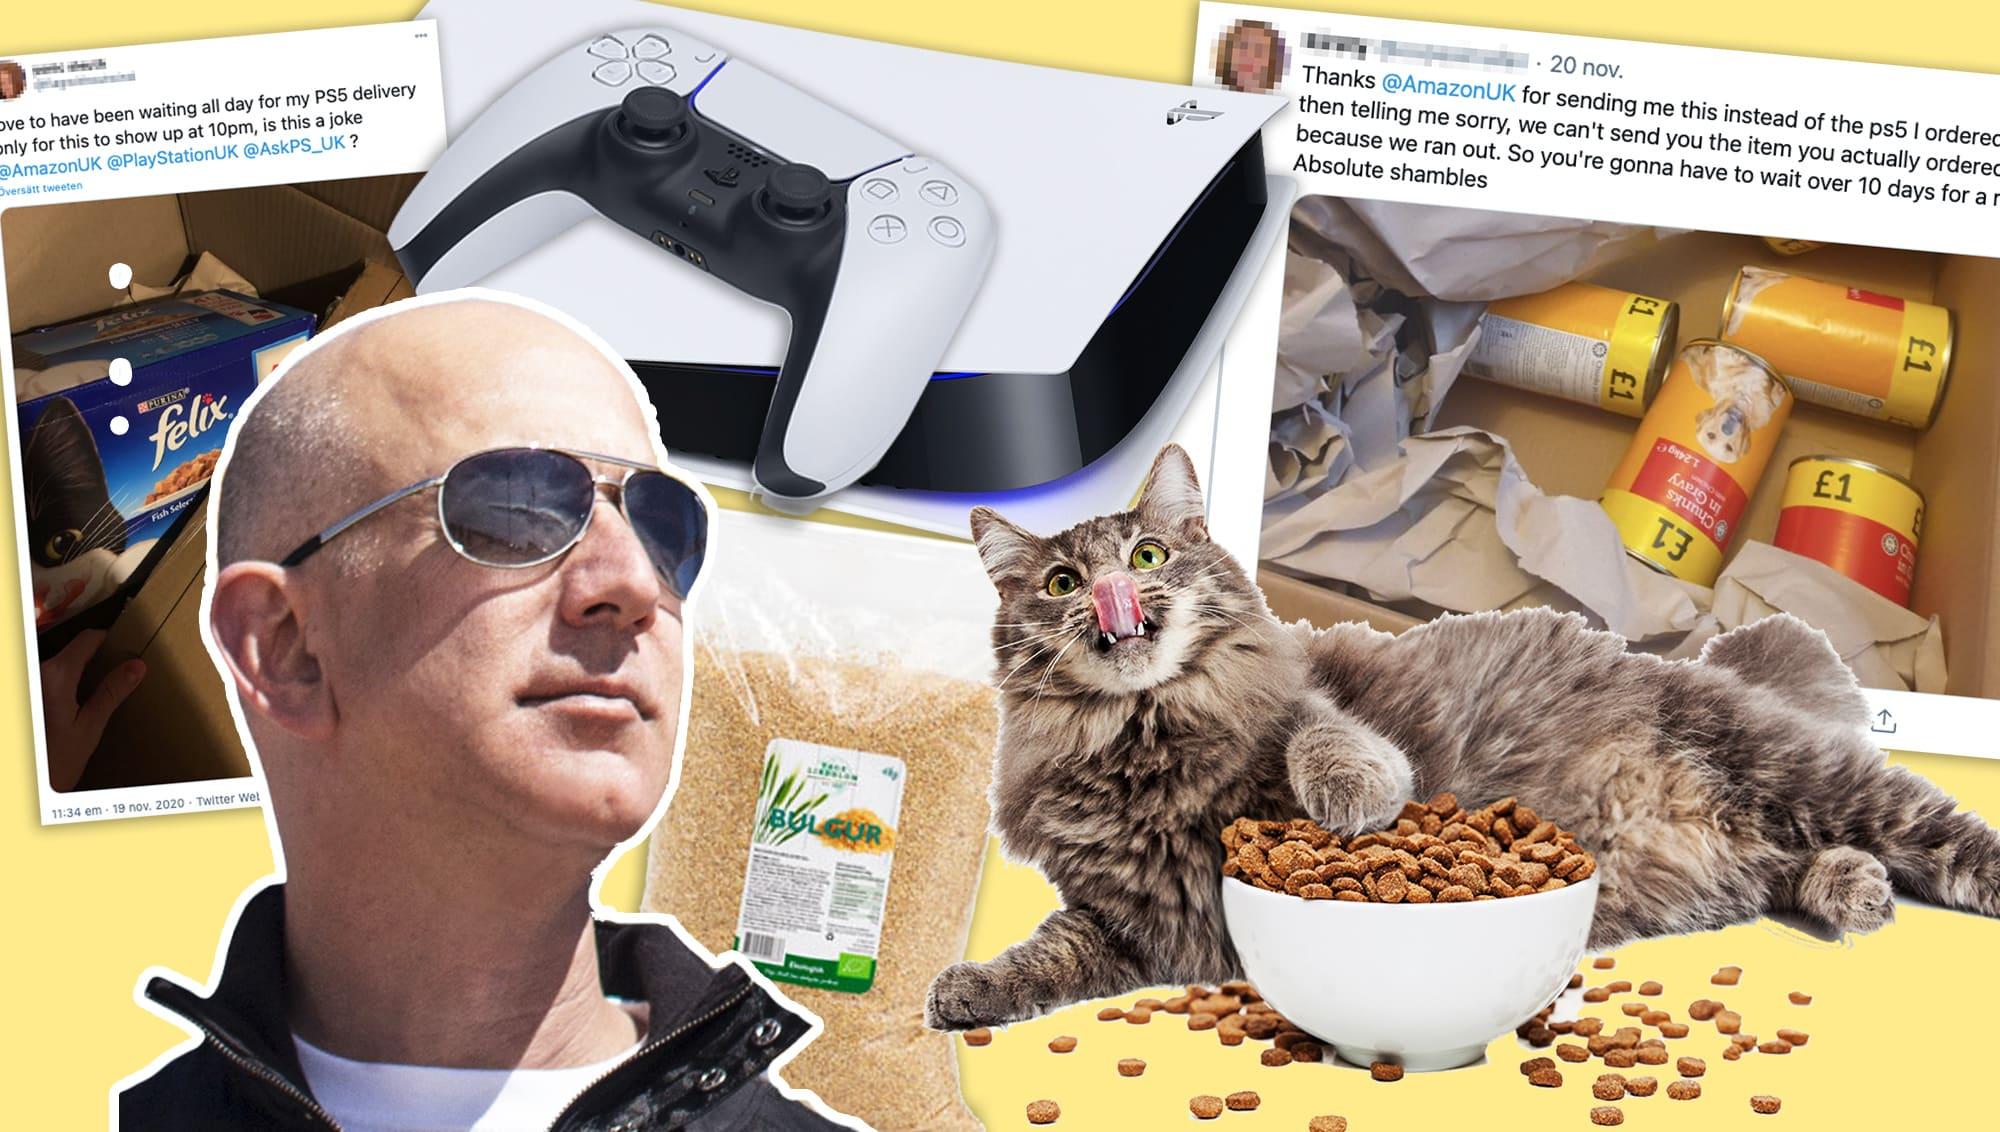 Beställde PlayStation 5 på Amazon – fick kattmat